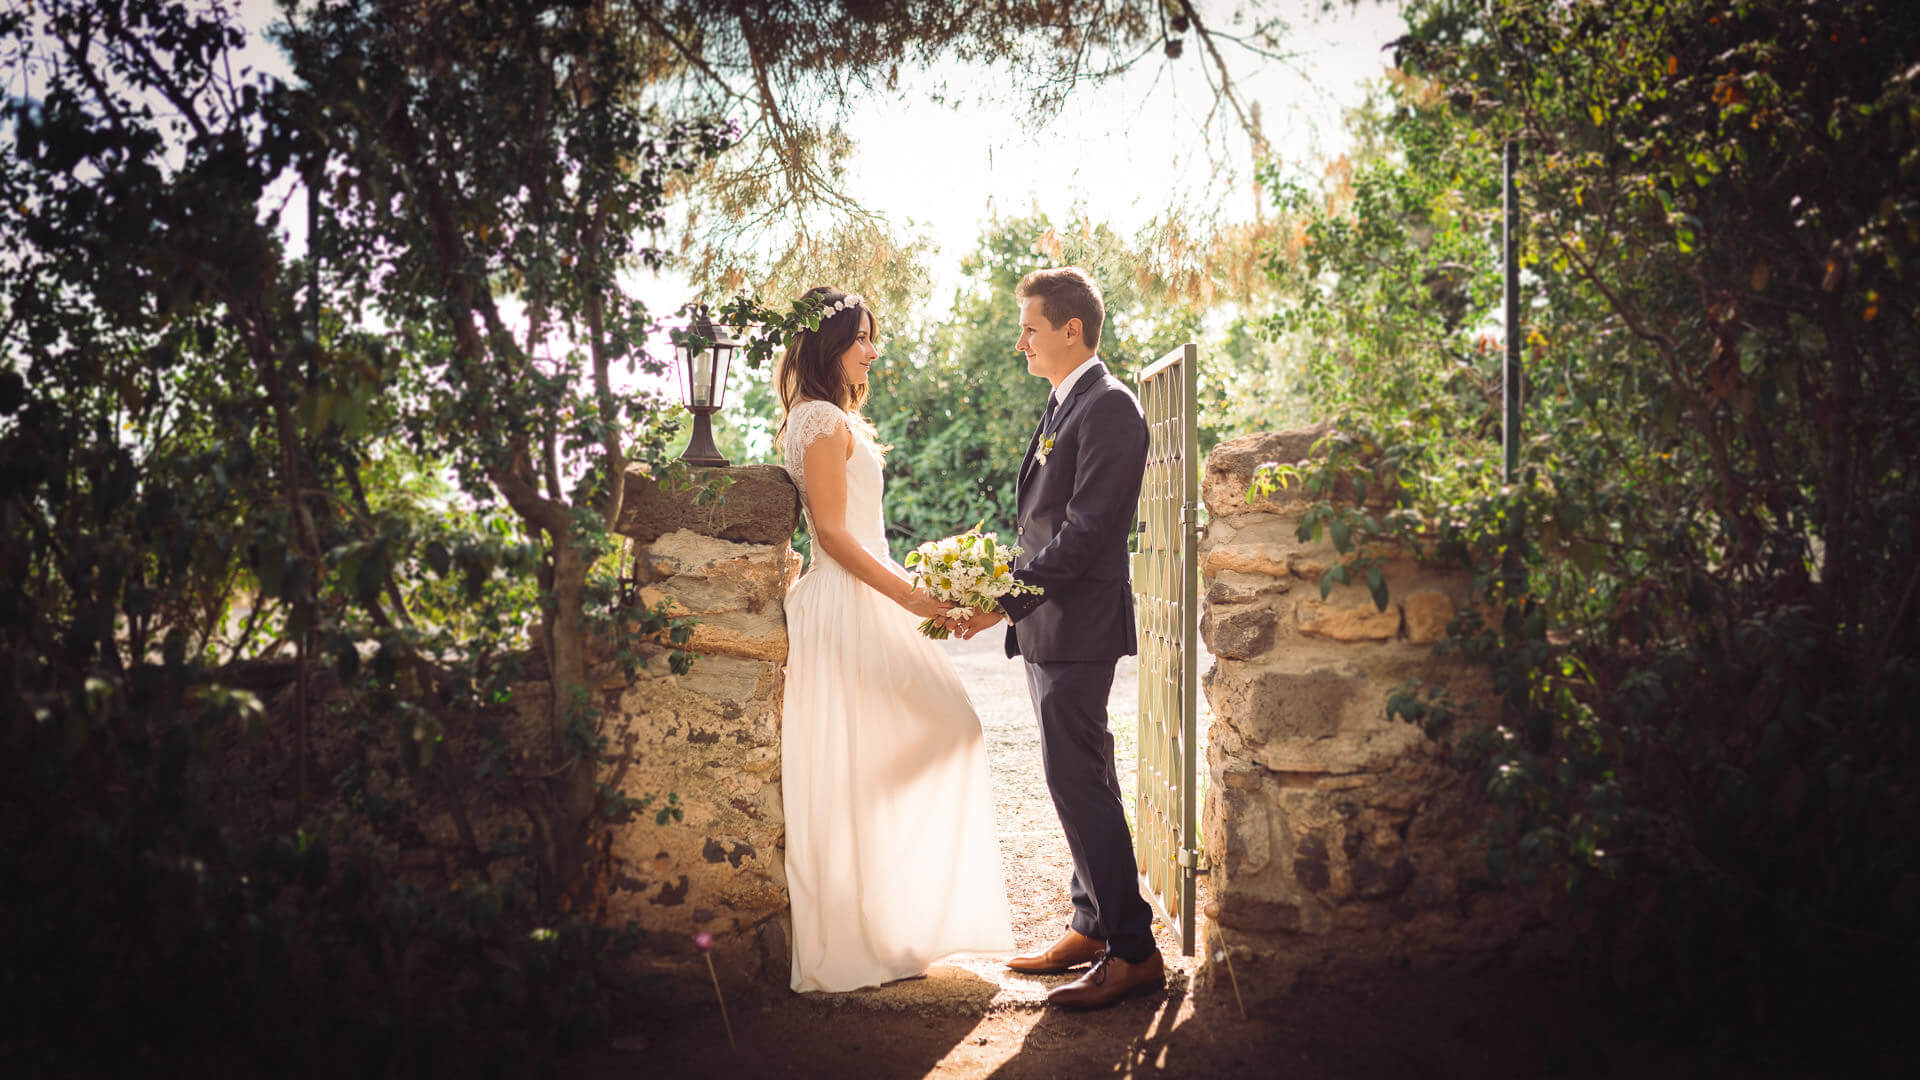 photographe mariage domaine beaumont agde studio graou